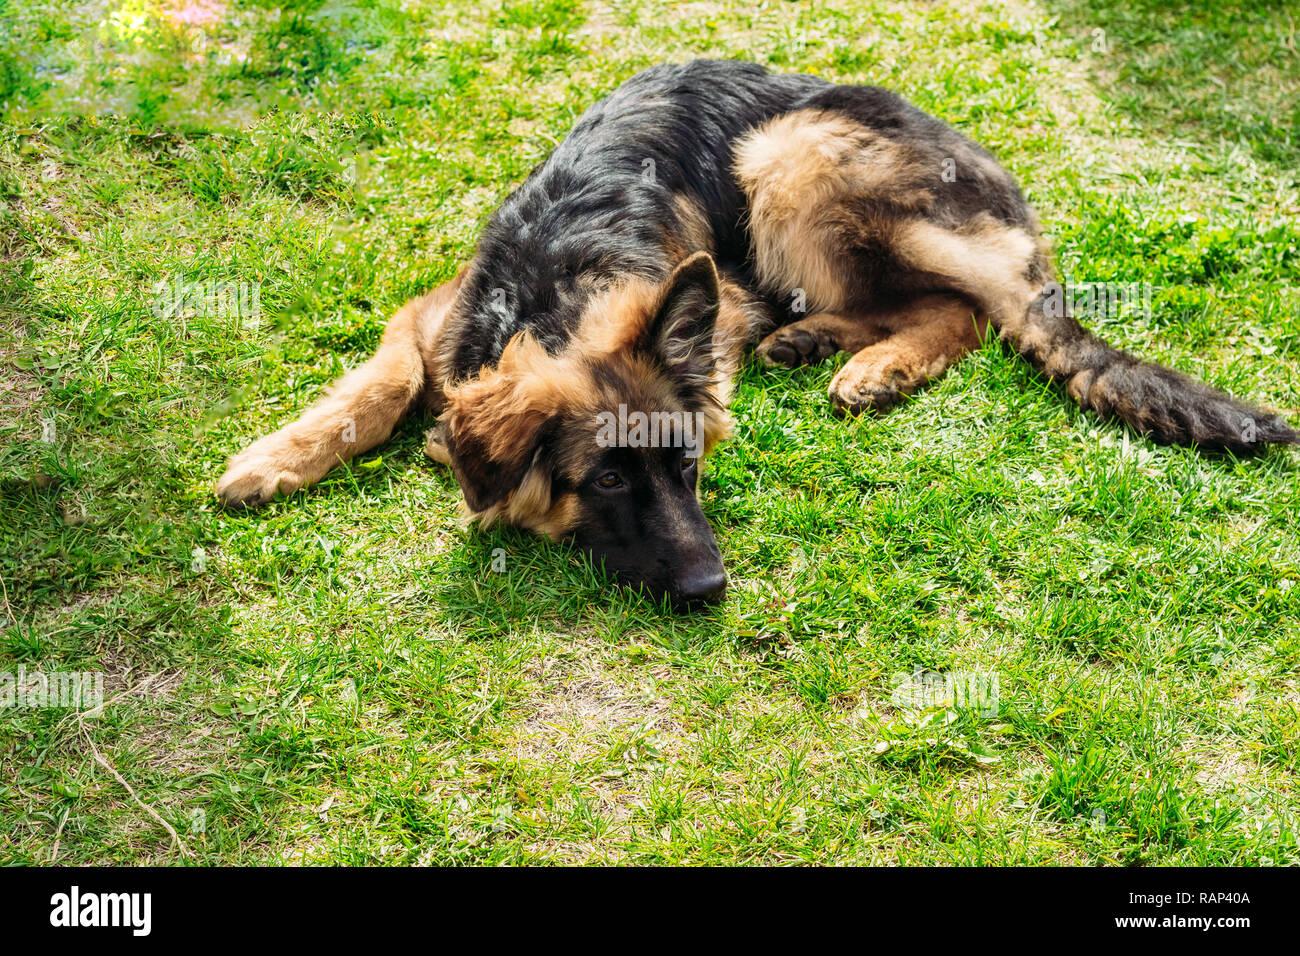 Adult German Shepherd dog resting on green grass - Stock Image